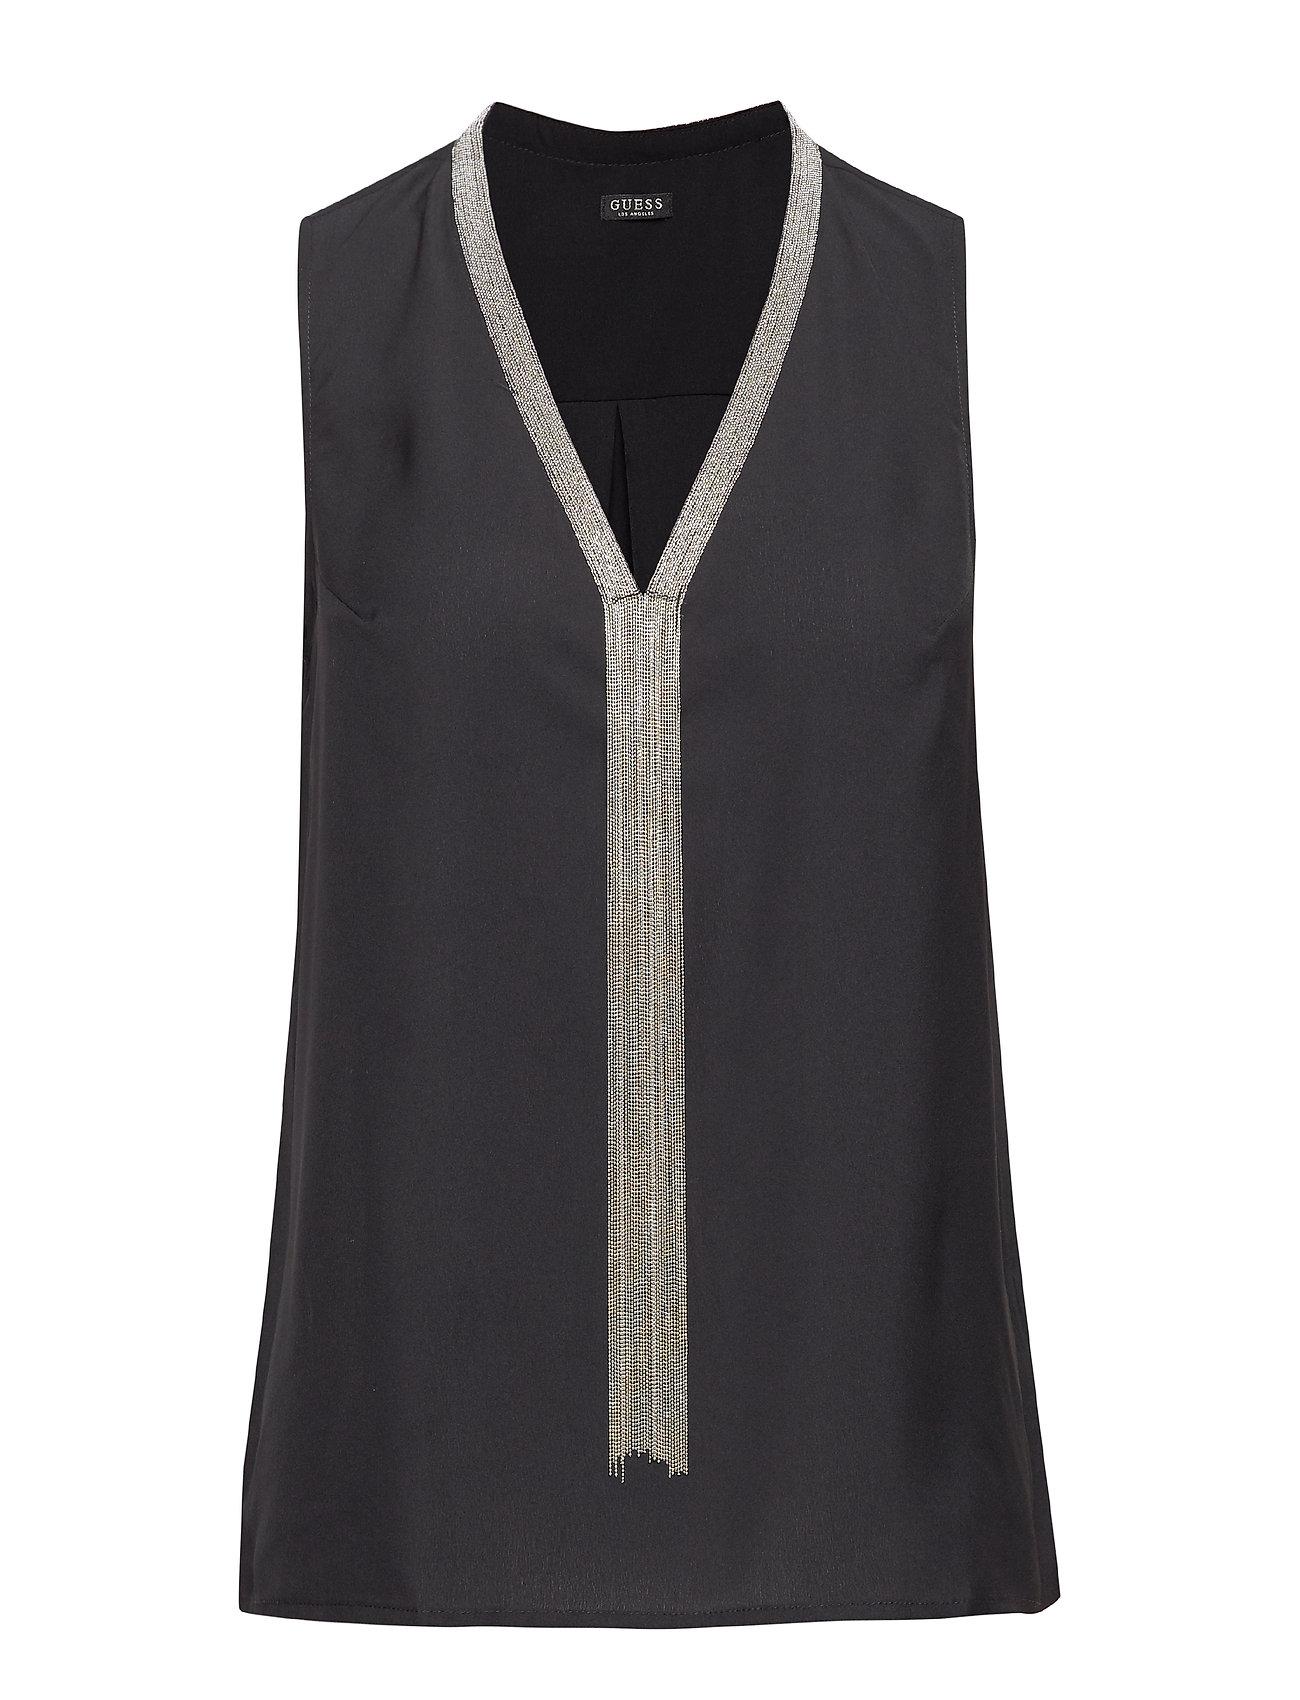 GUESS Jeans SL PILAR TOP - JET BLACK A996